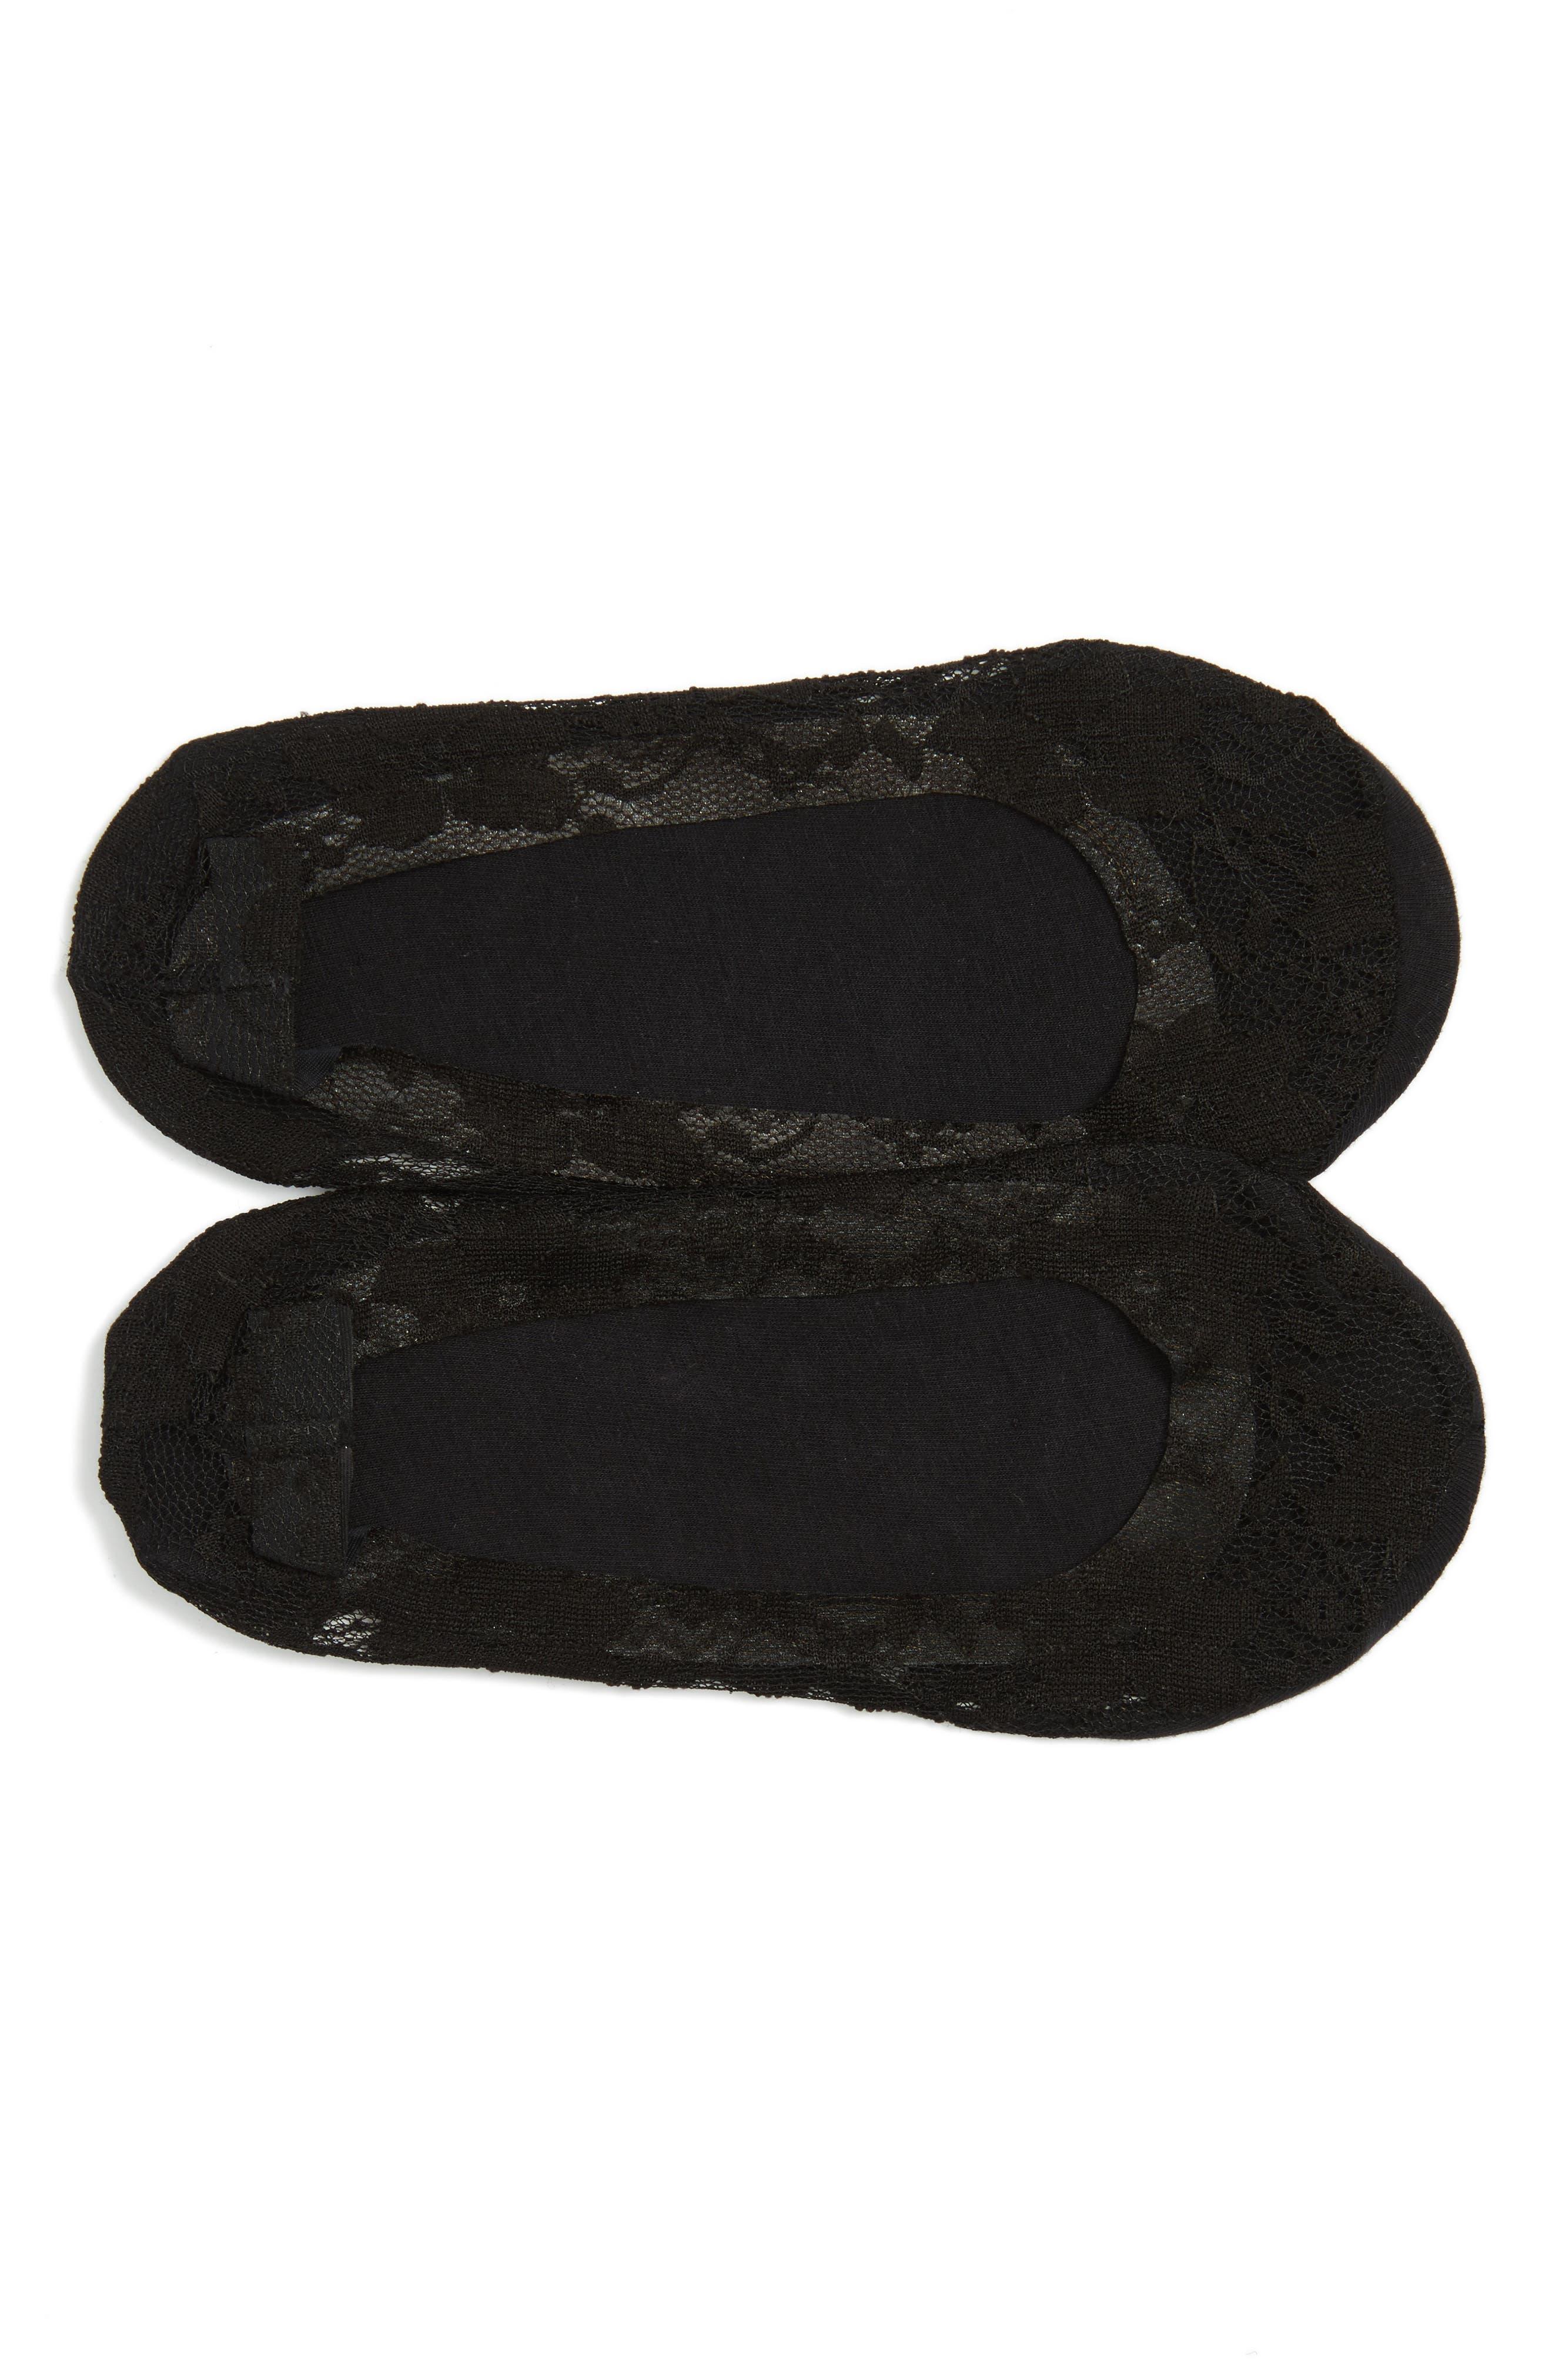 NORDSTROM, 2-Pack Lace Liner Socks, Main thumbnail 1, color, BLACK